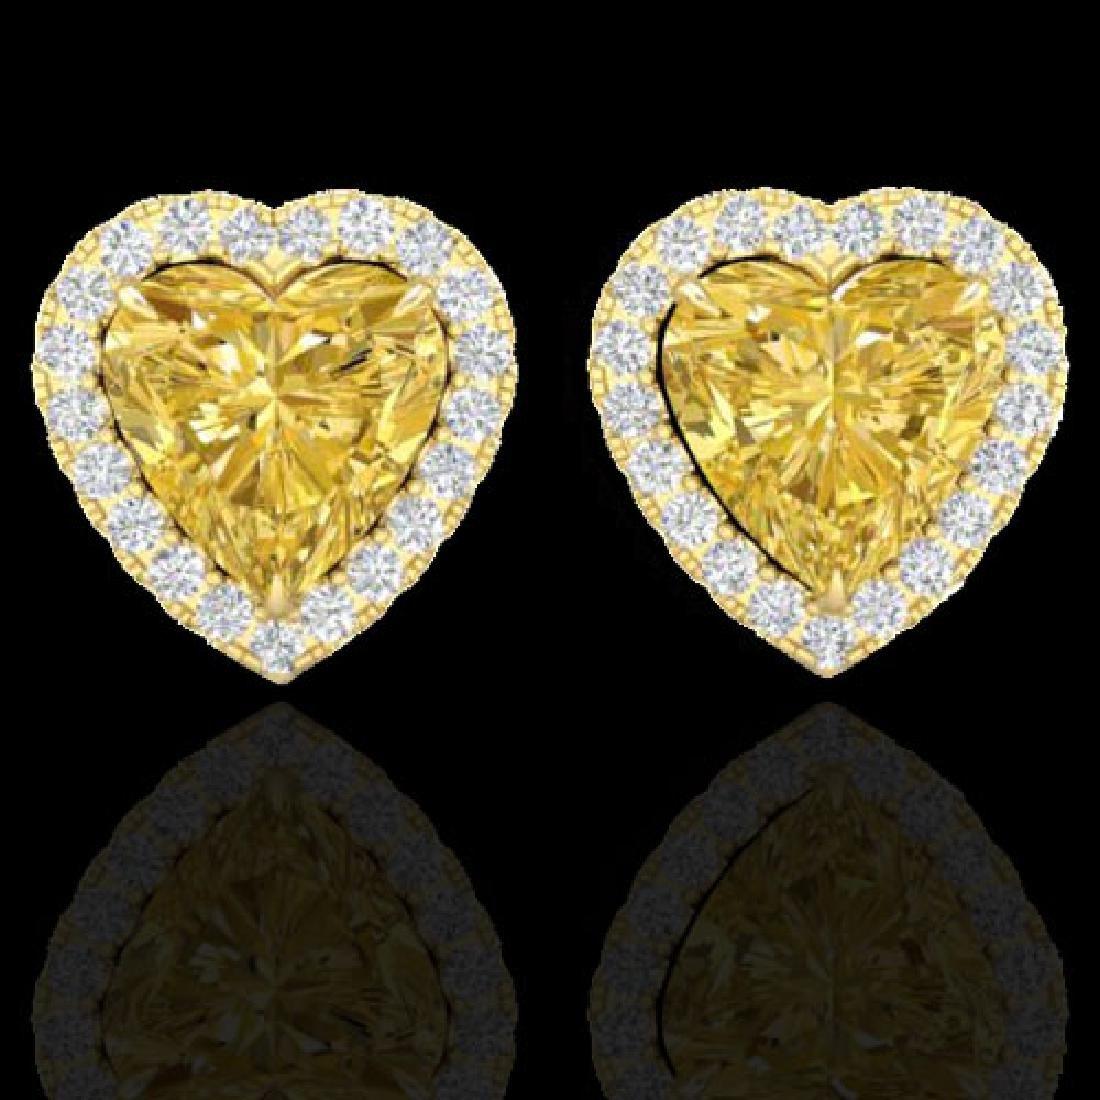 2 CTW Citrine & Micro Pave VS/SI Diamond Earrings Heart